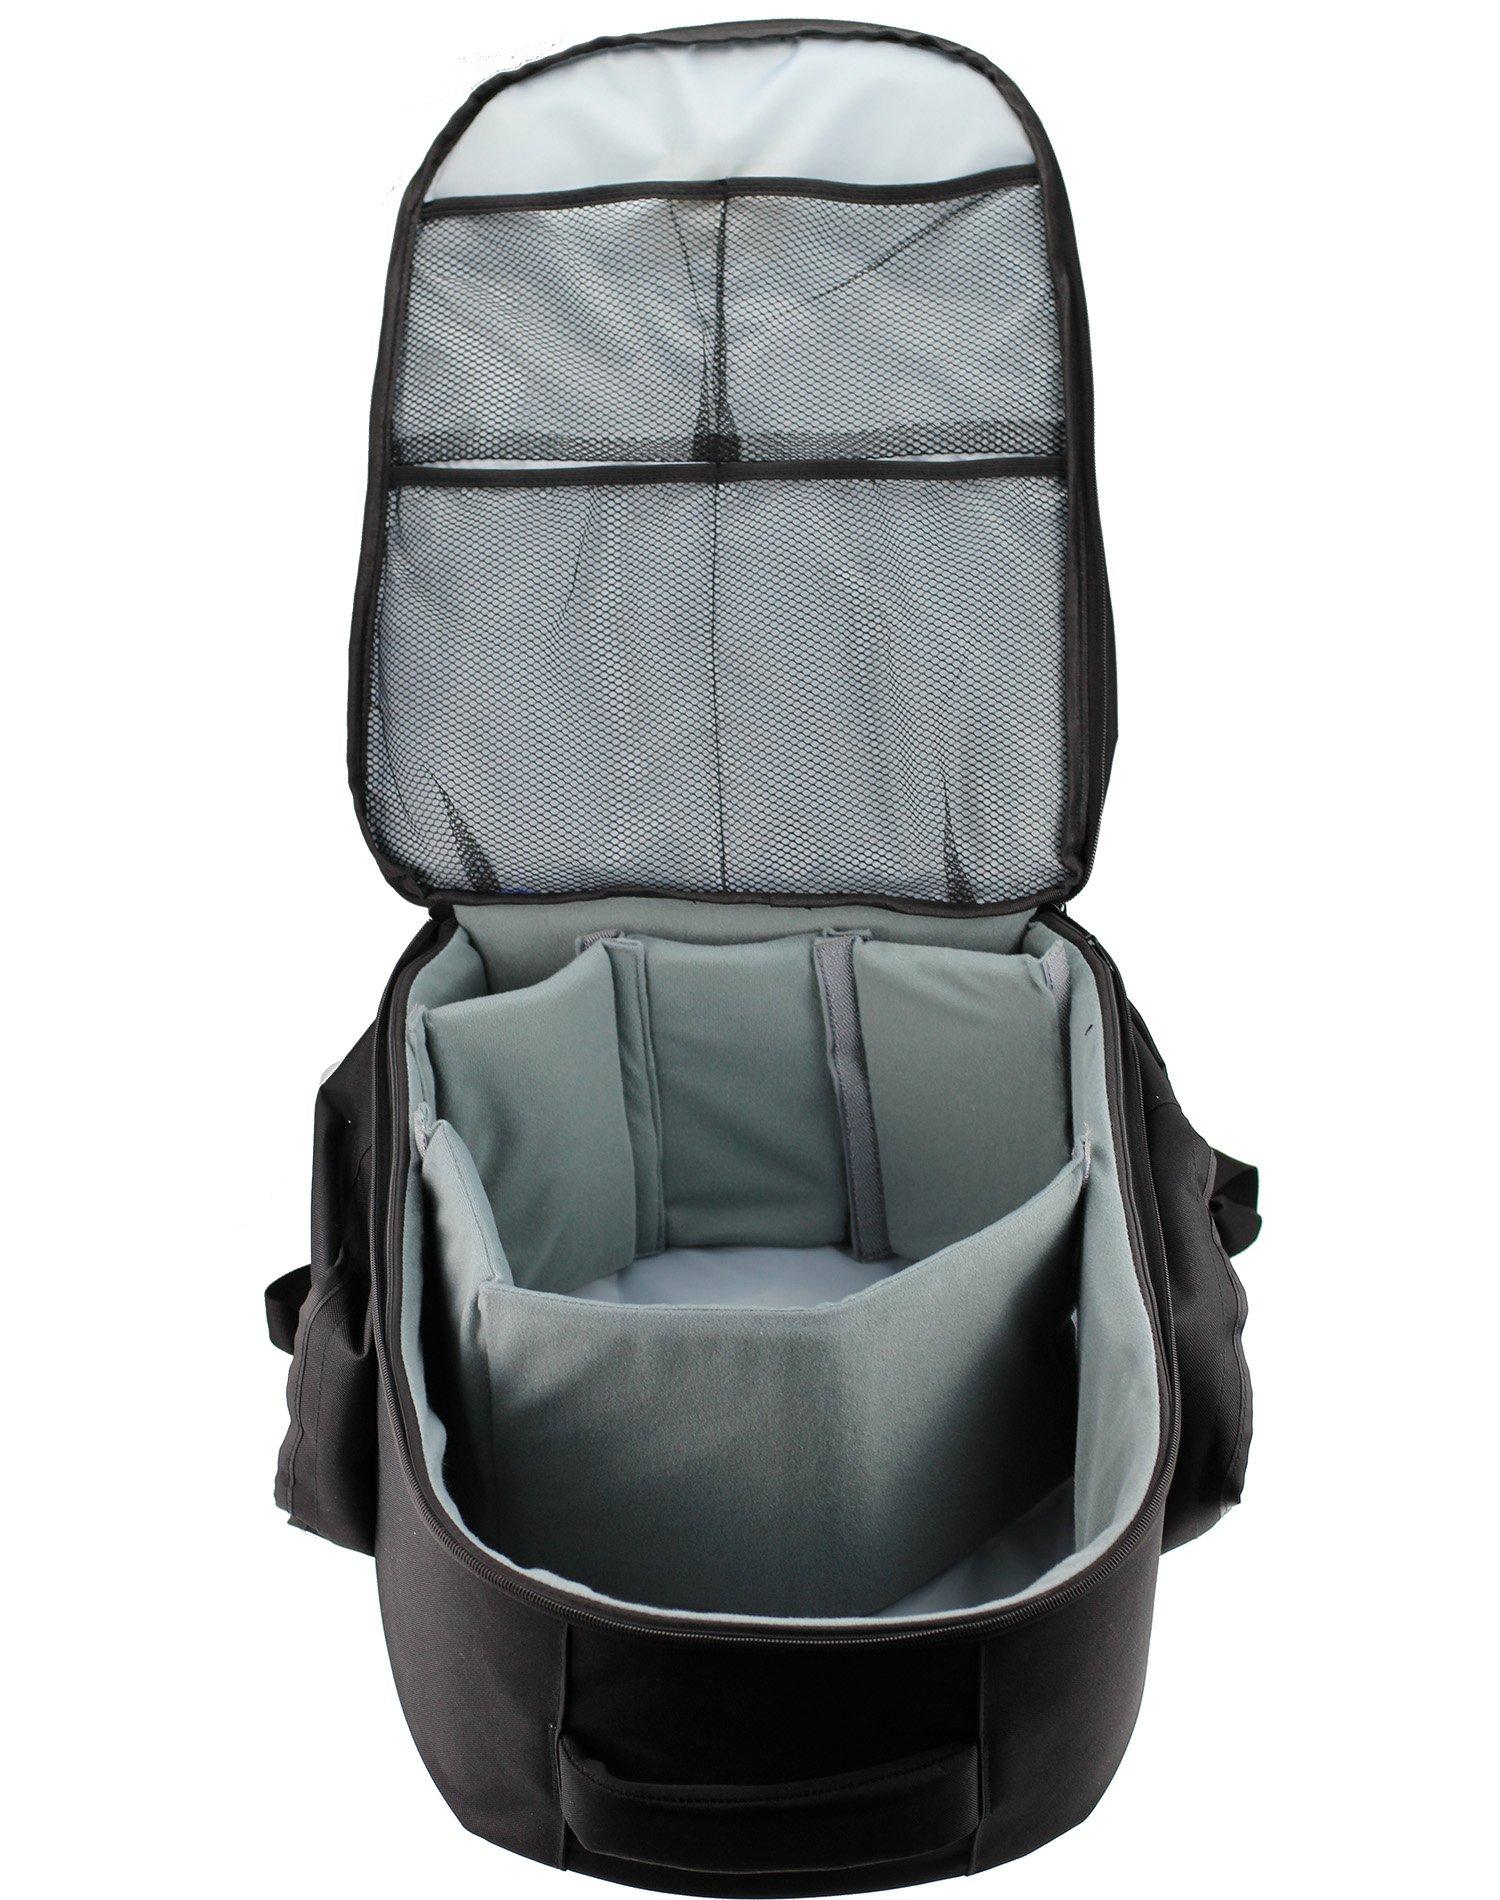 Navitech Rugged Black Backpack/Rucksack for The Oculus Rift + Oculus Touch Controller by Navitech (Image #6)